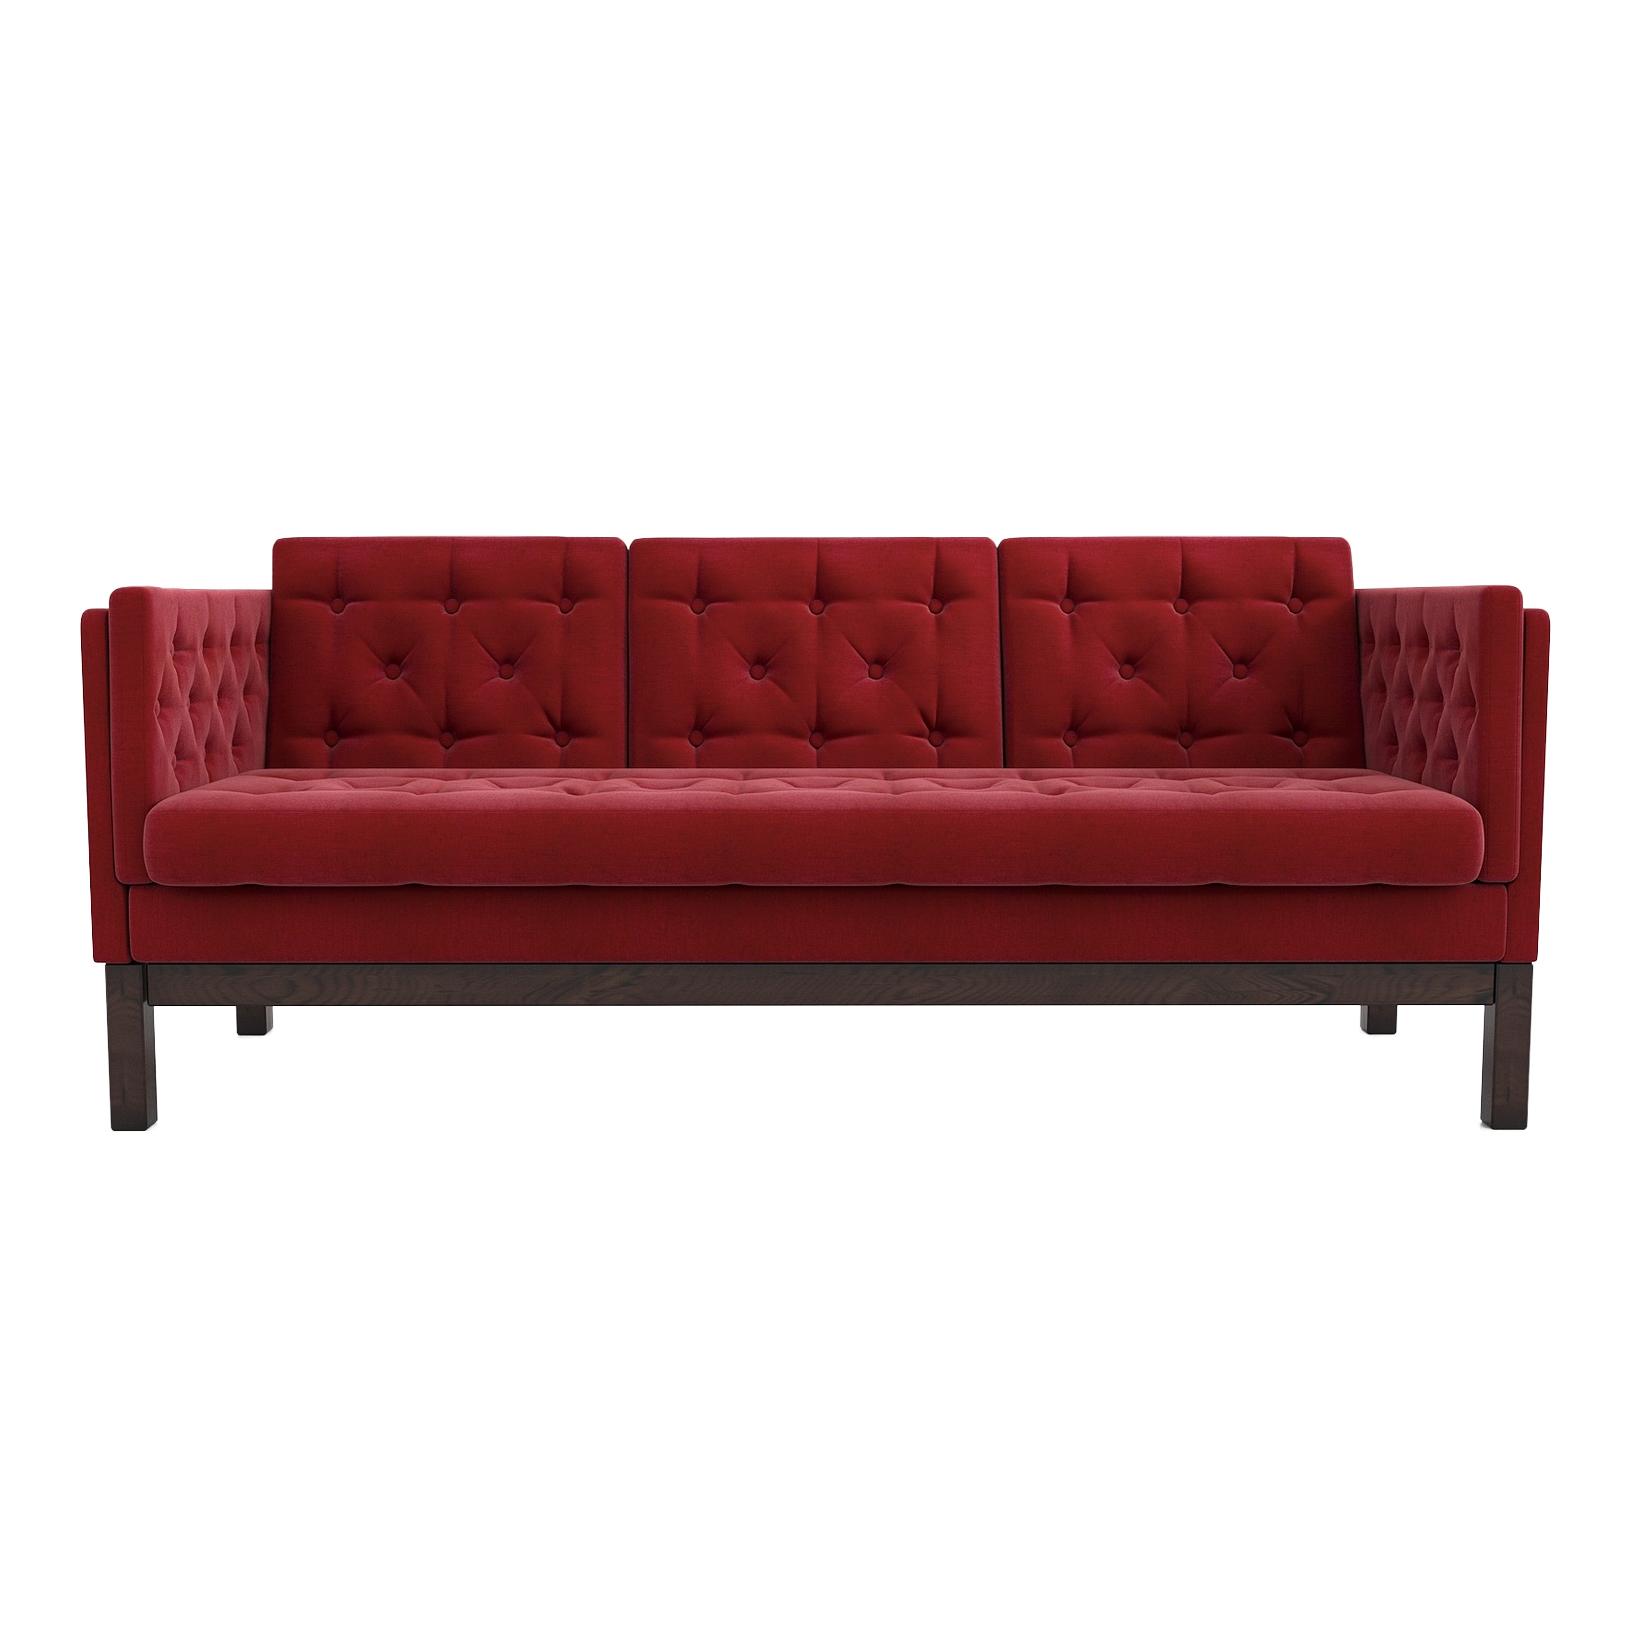 Фото - Диван AS Алана б 193x82x83 венге/красный диван as алана б 193x82x83 венге бейдж